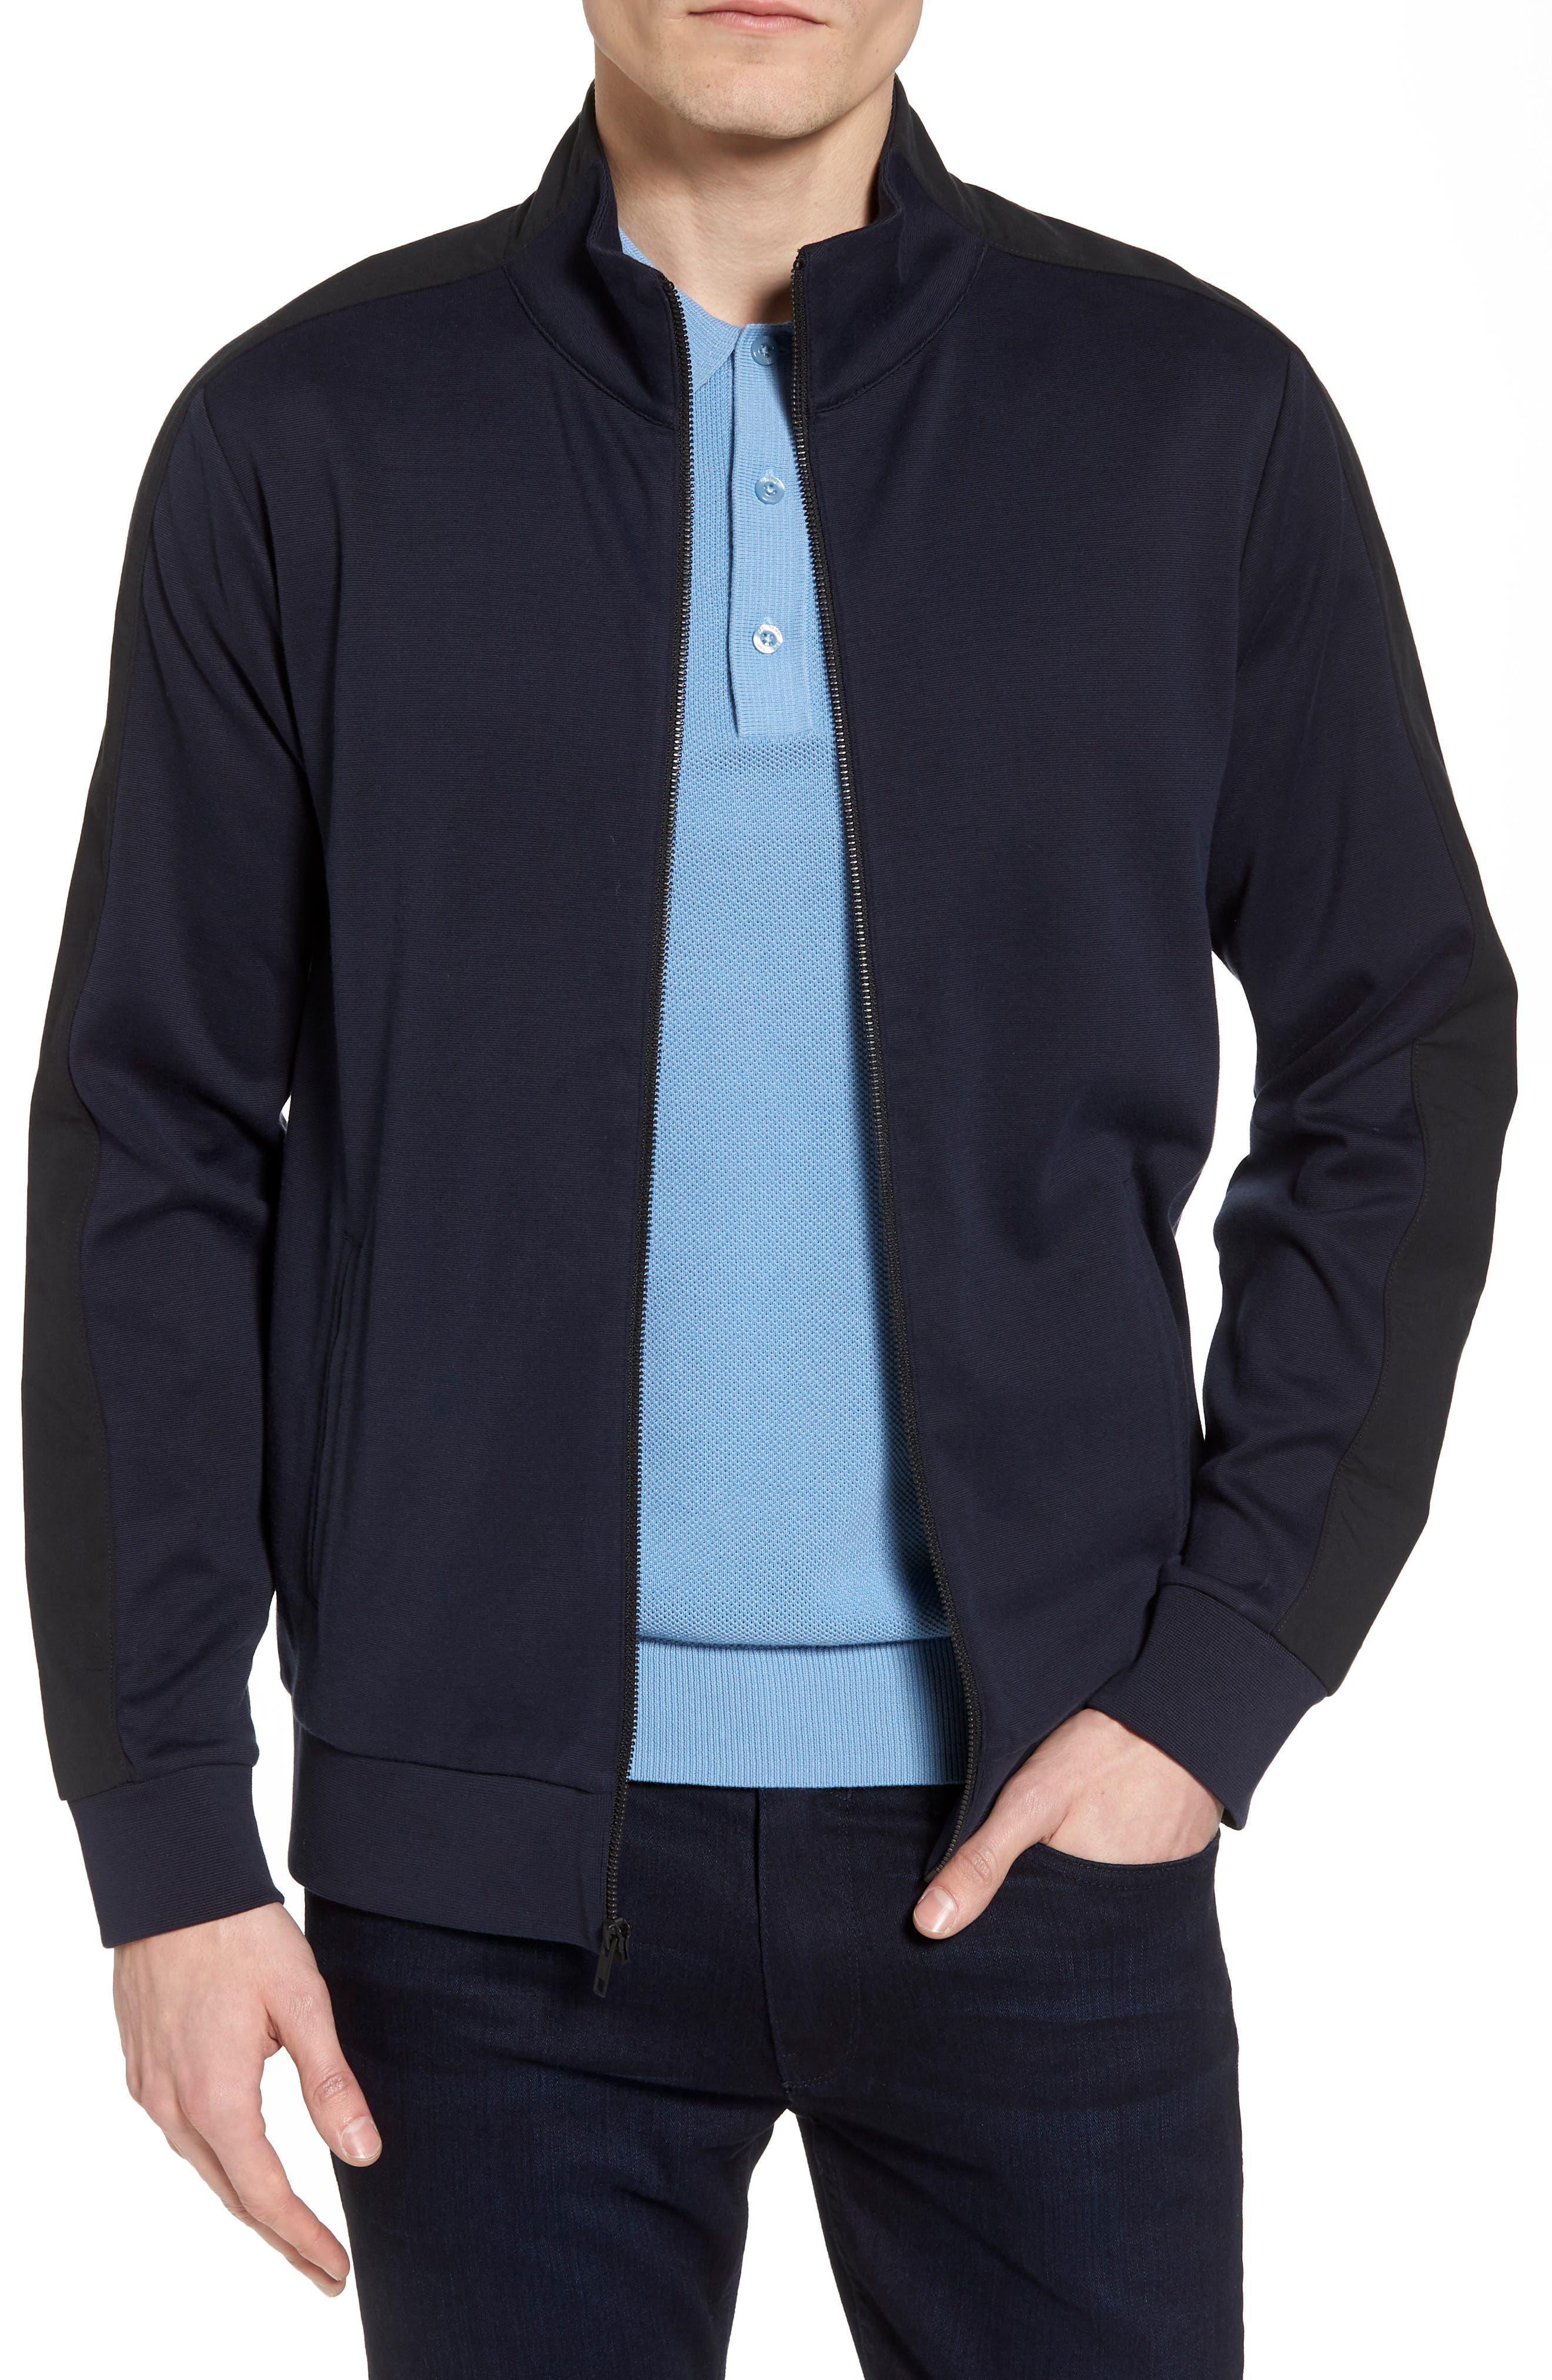 Fleece Jacket,                         Main,                         color, Navy Night Black